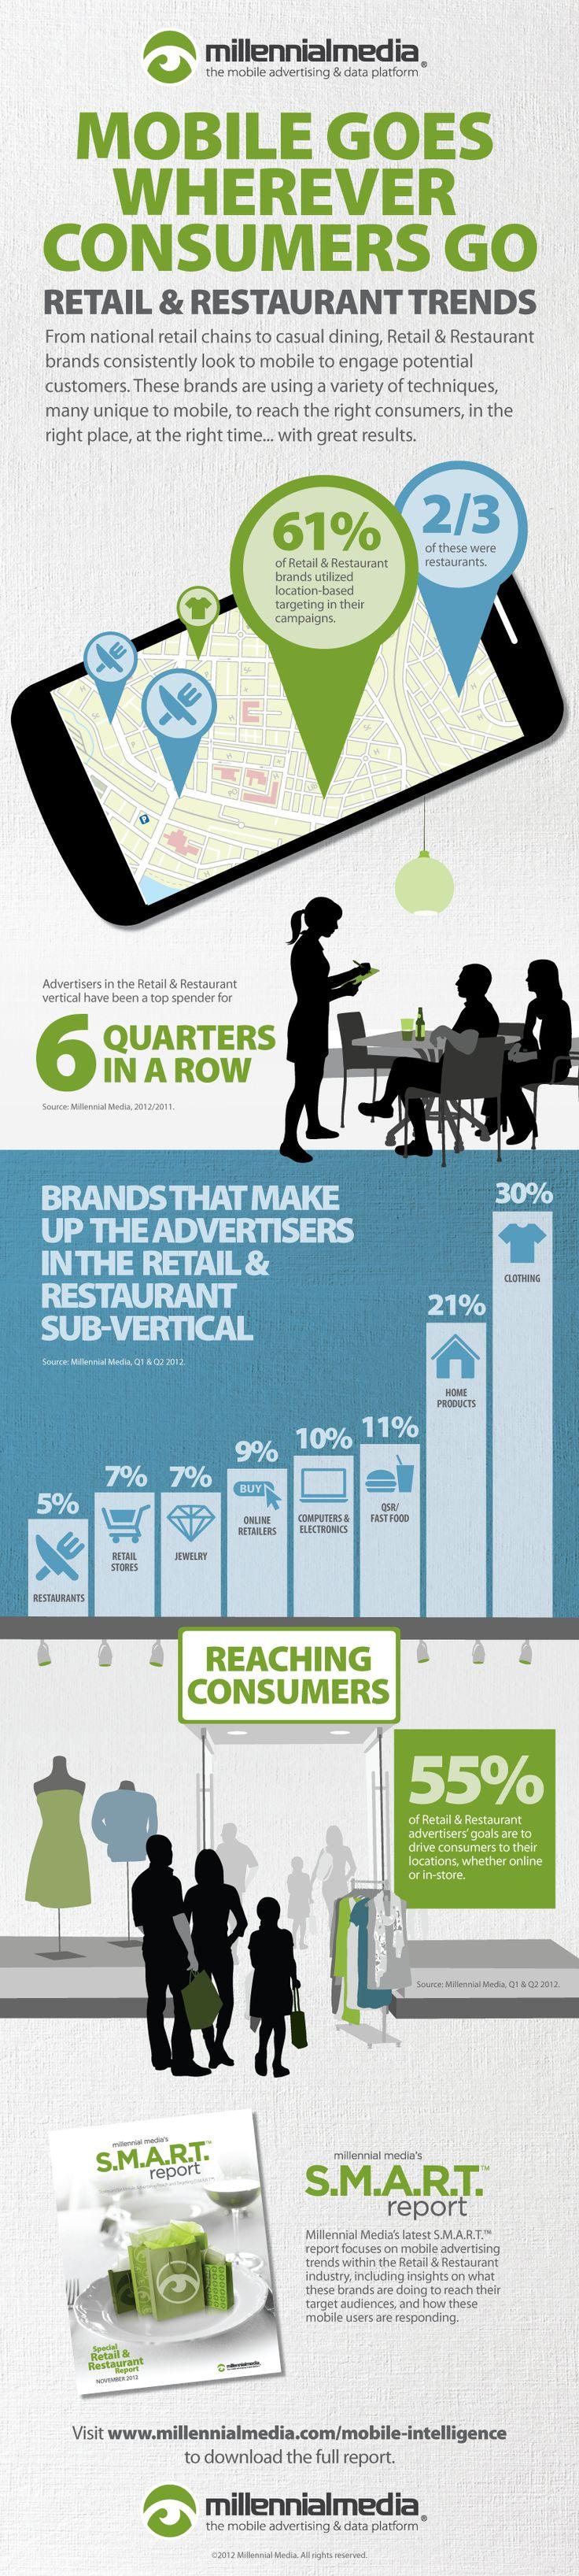 #MobileMarketing among #Restaurants and Retail